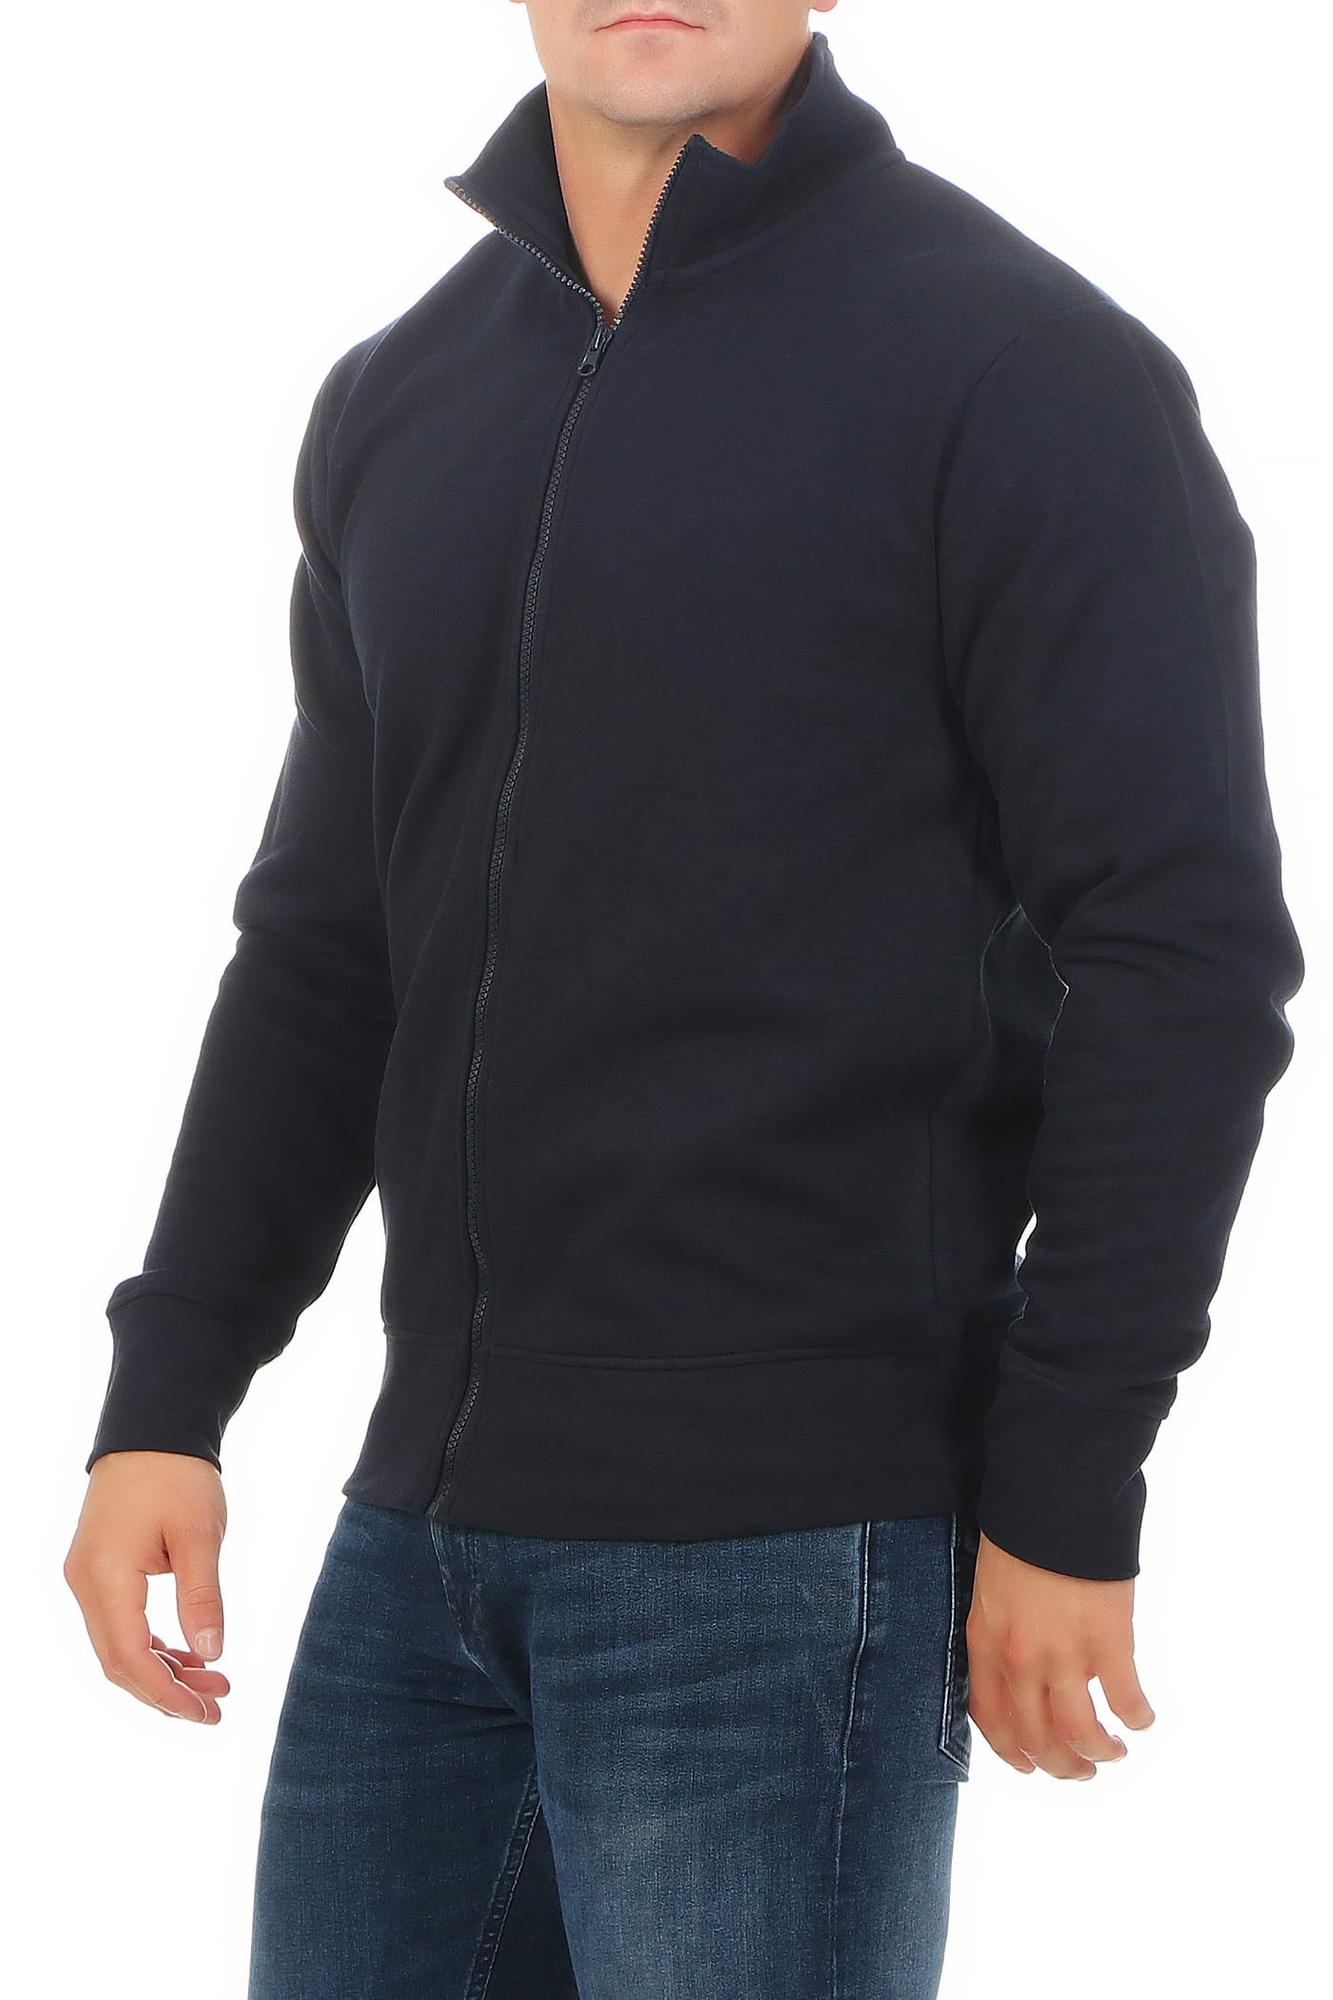 Details zu Herren Sweatjacke ohne Kapuze Zip Jacke Reißverschluss Kragen Zipper Sweatshirt